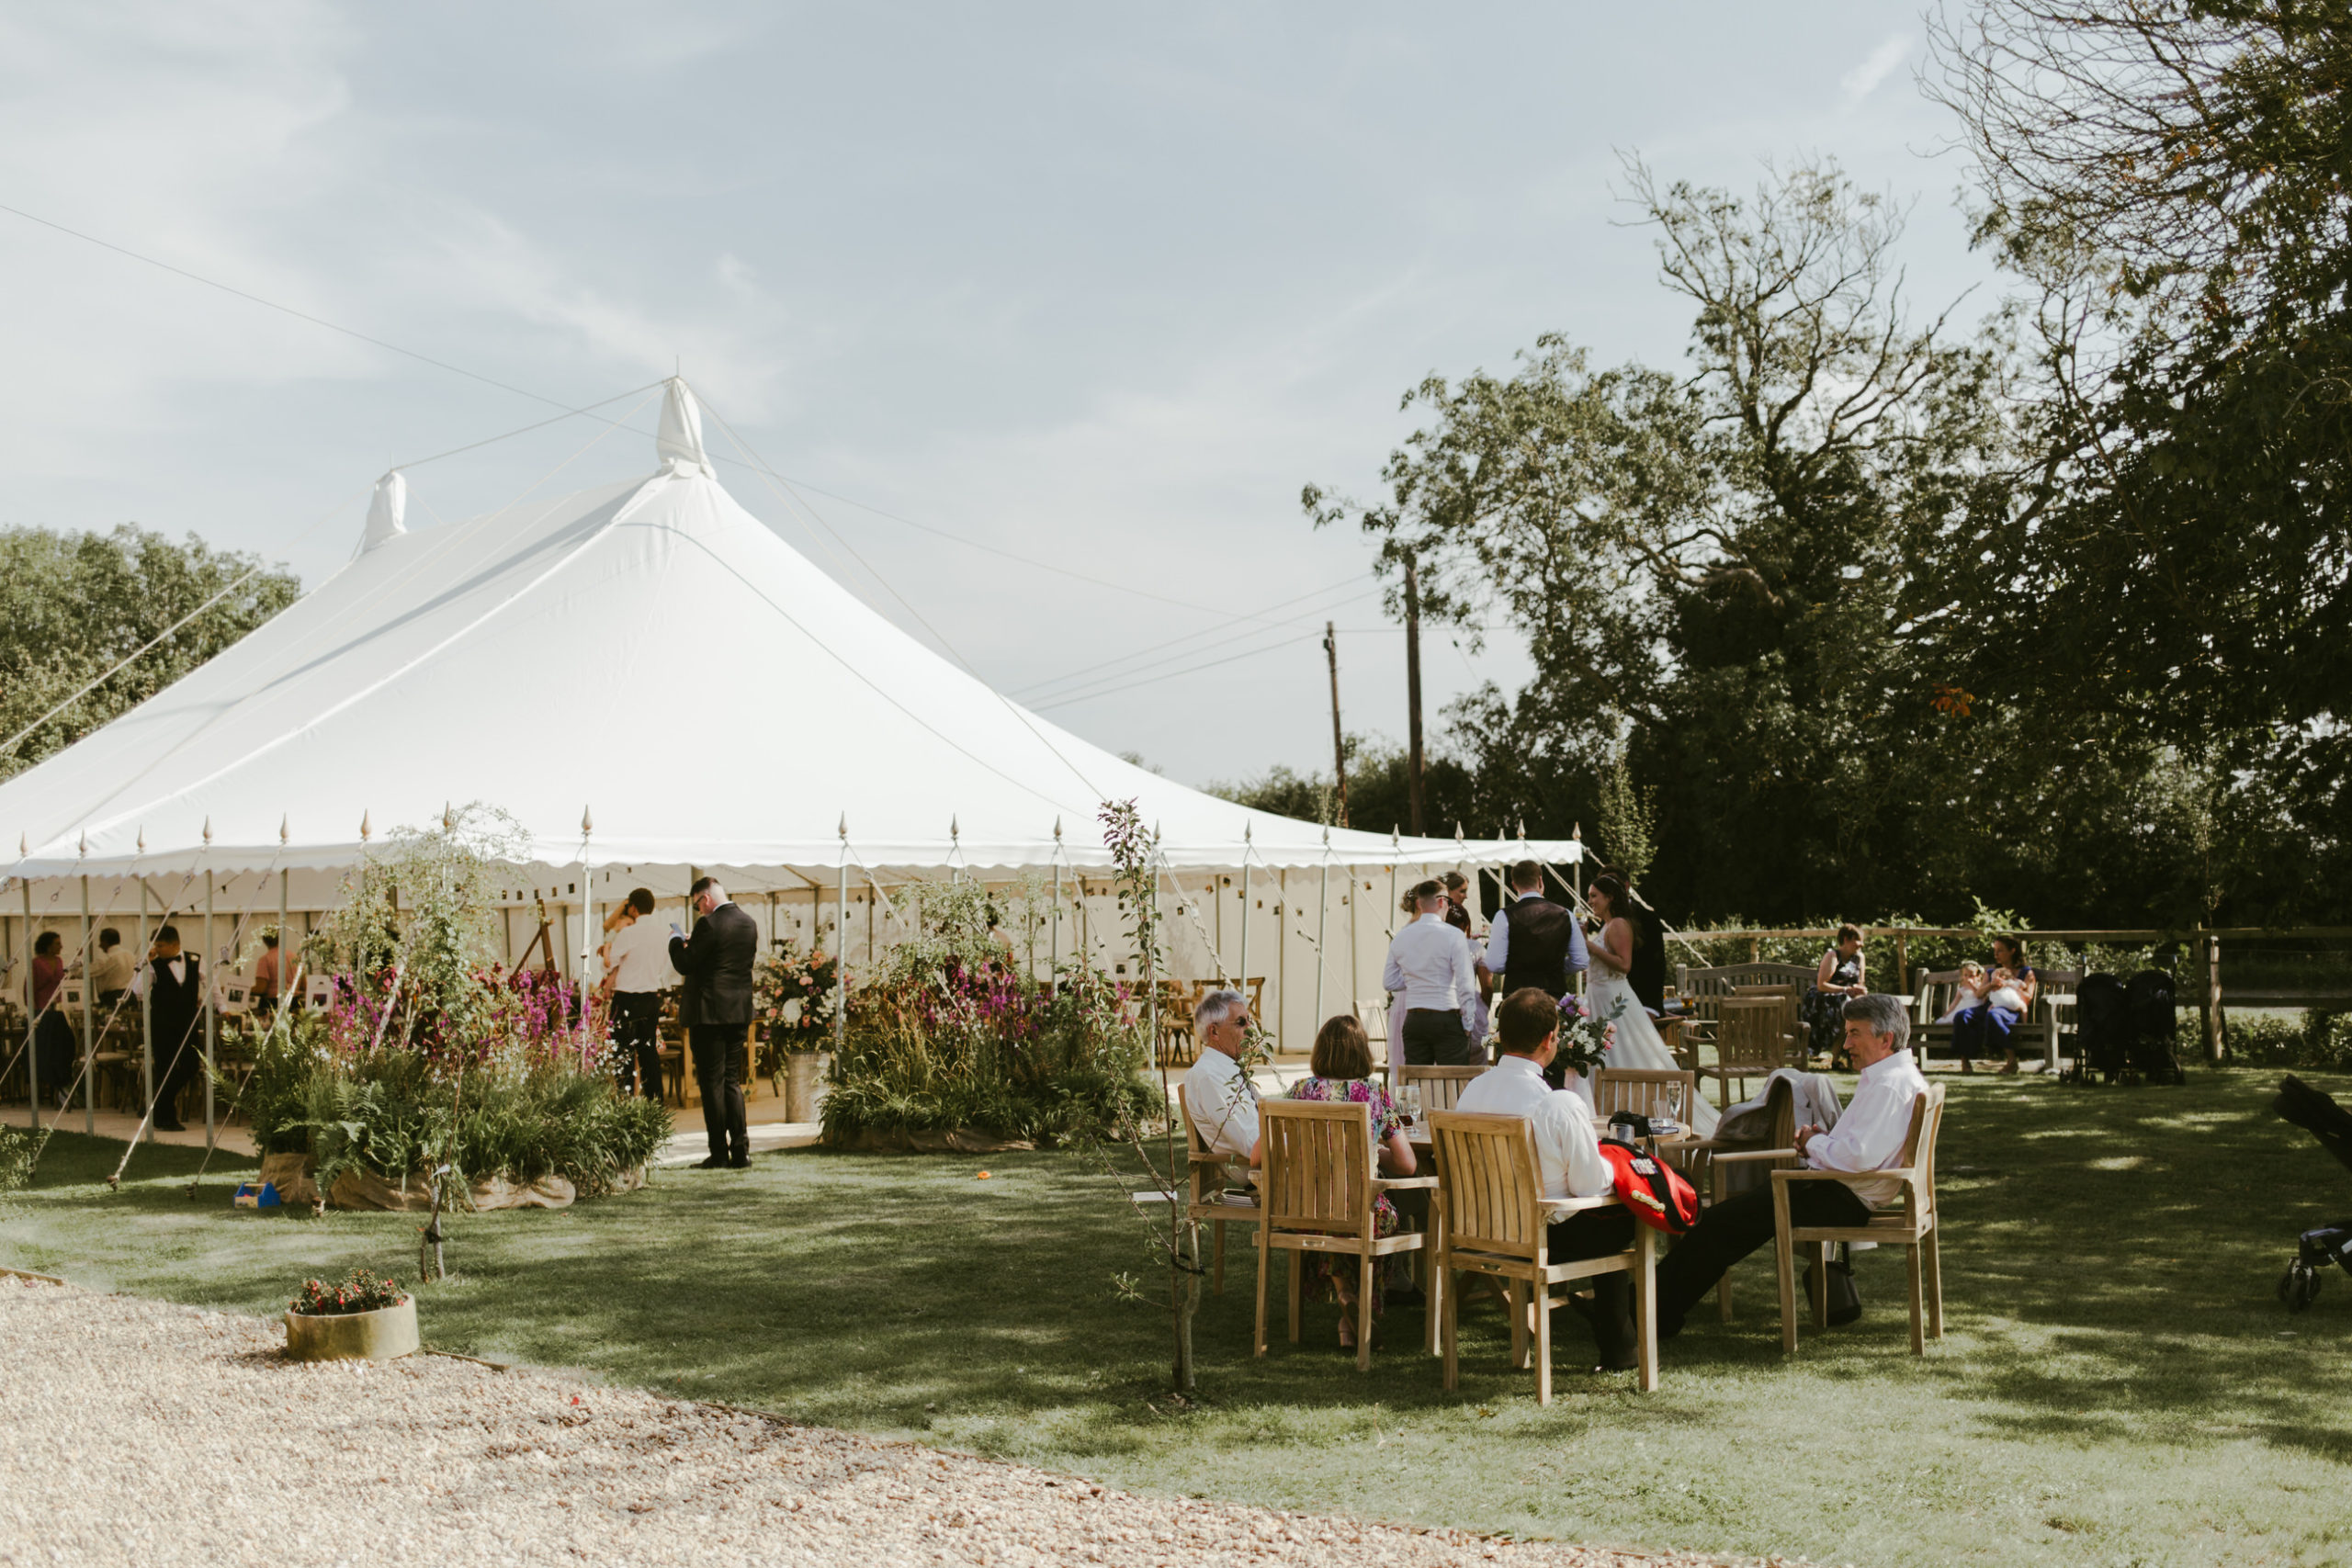 summer wedding back garden party marquee